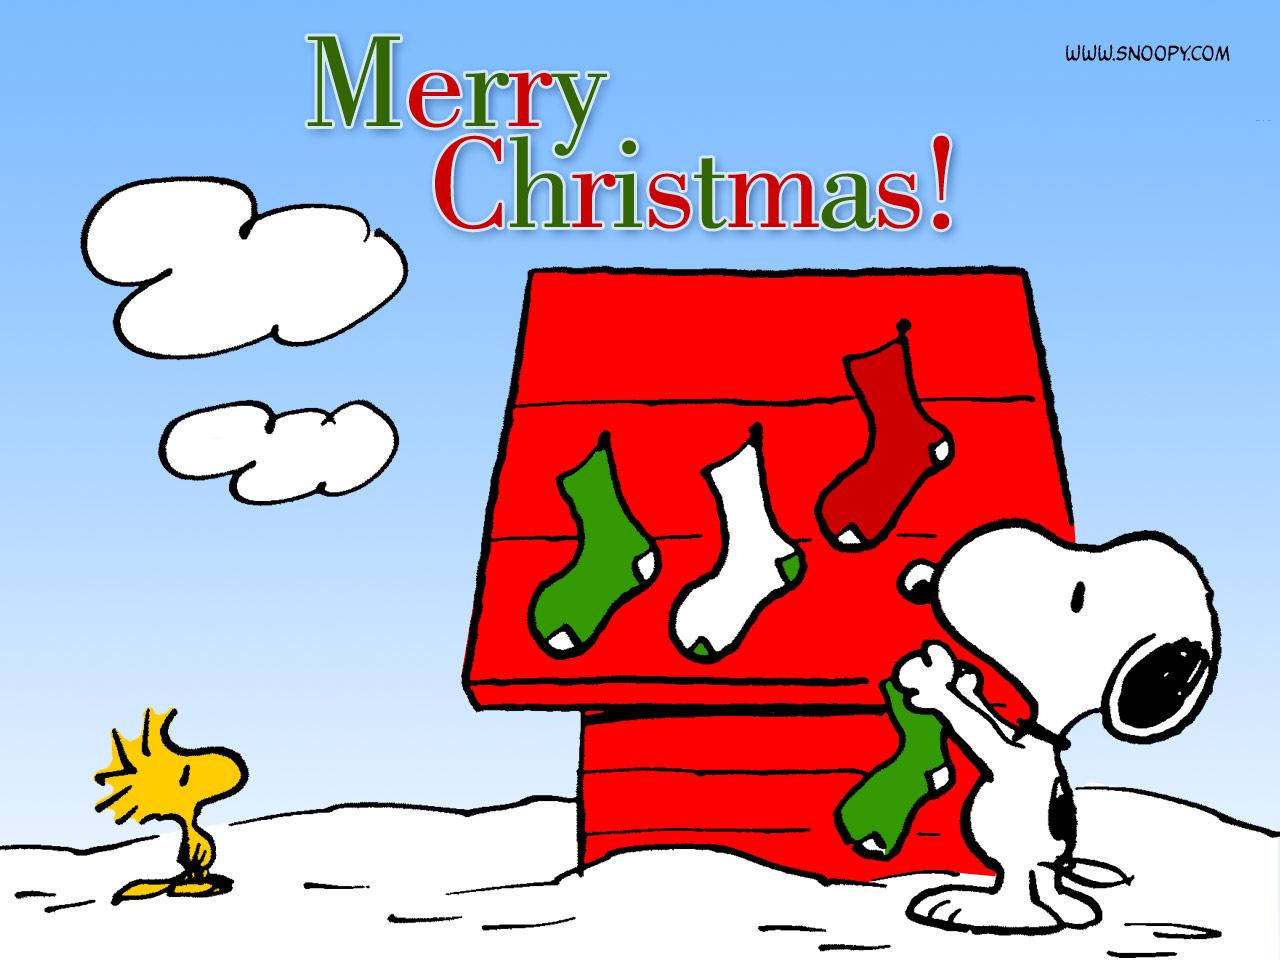 Merry Christmas Charlie Brown 1280x960